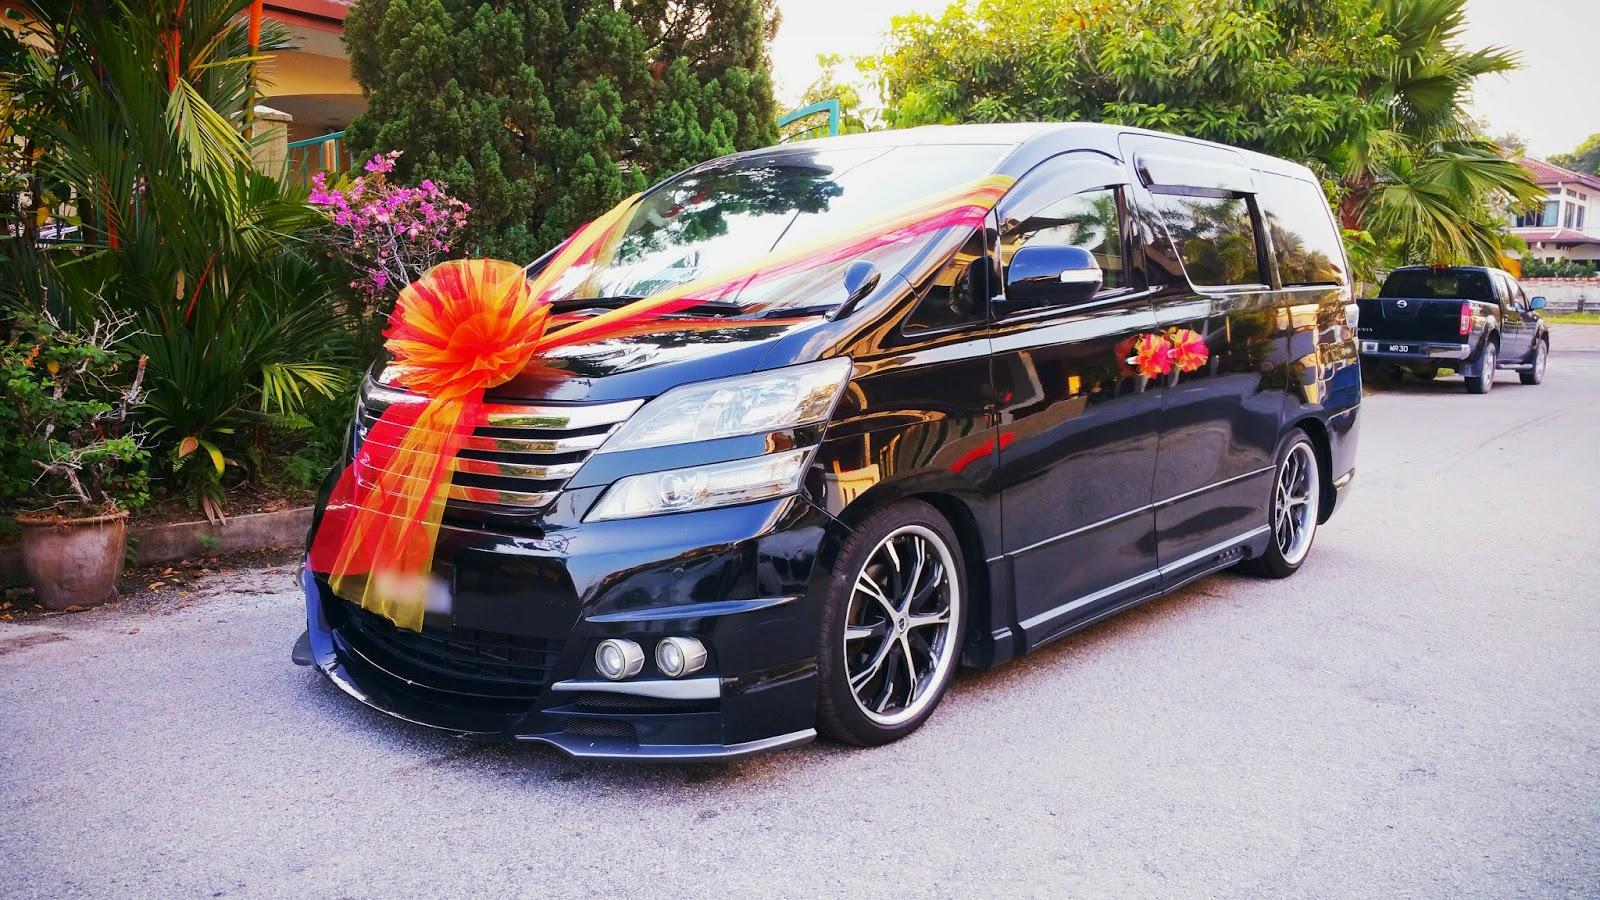 Redorca malaysia wedding and event car rental toyota vellfire toyota vellfire wedding car rental junglespirit Choice Image